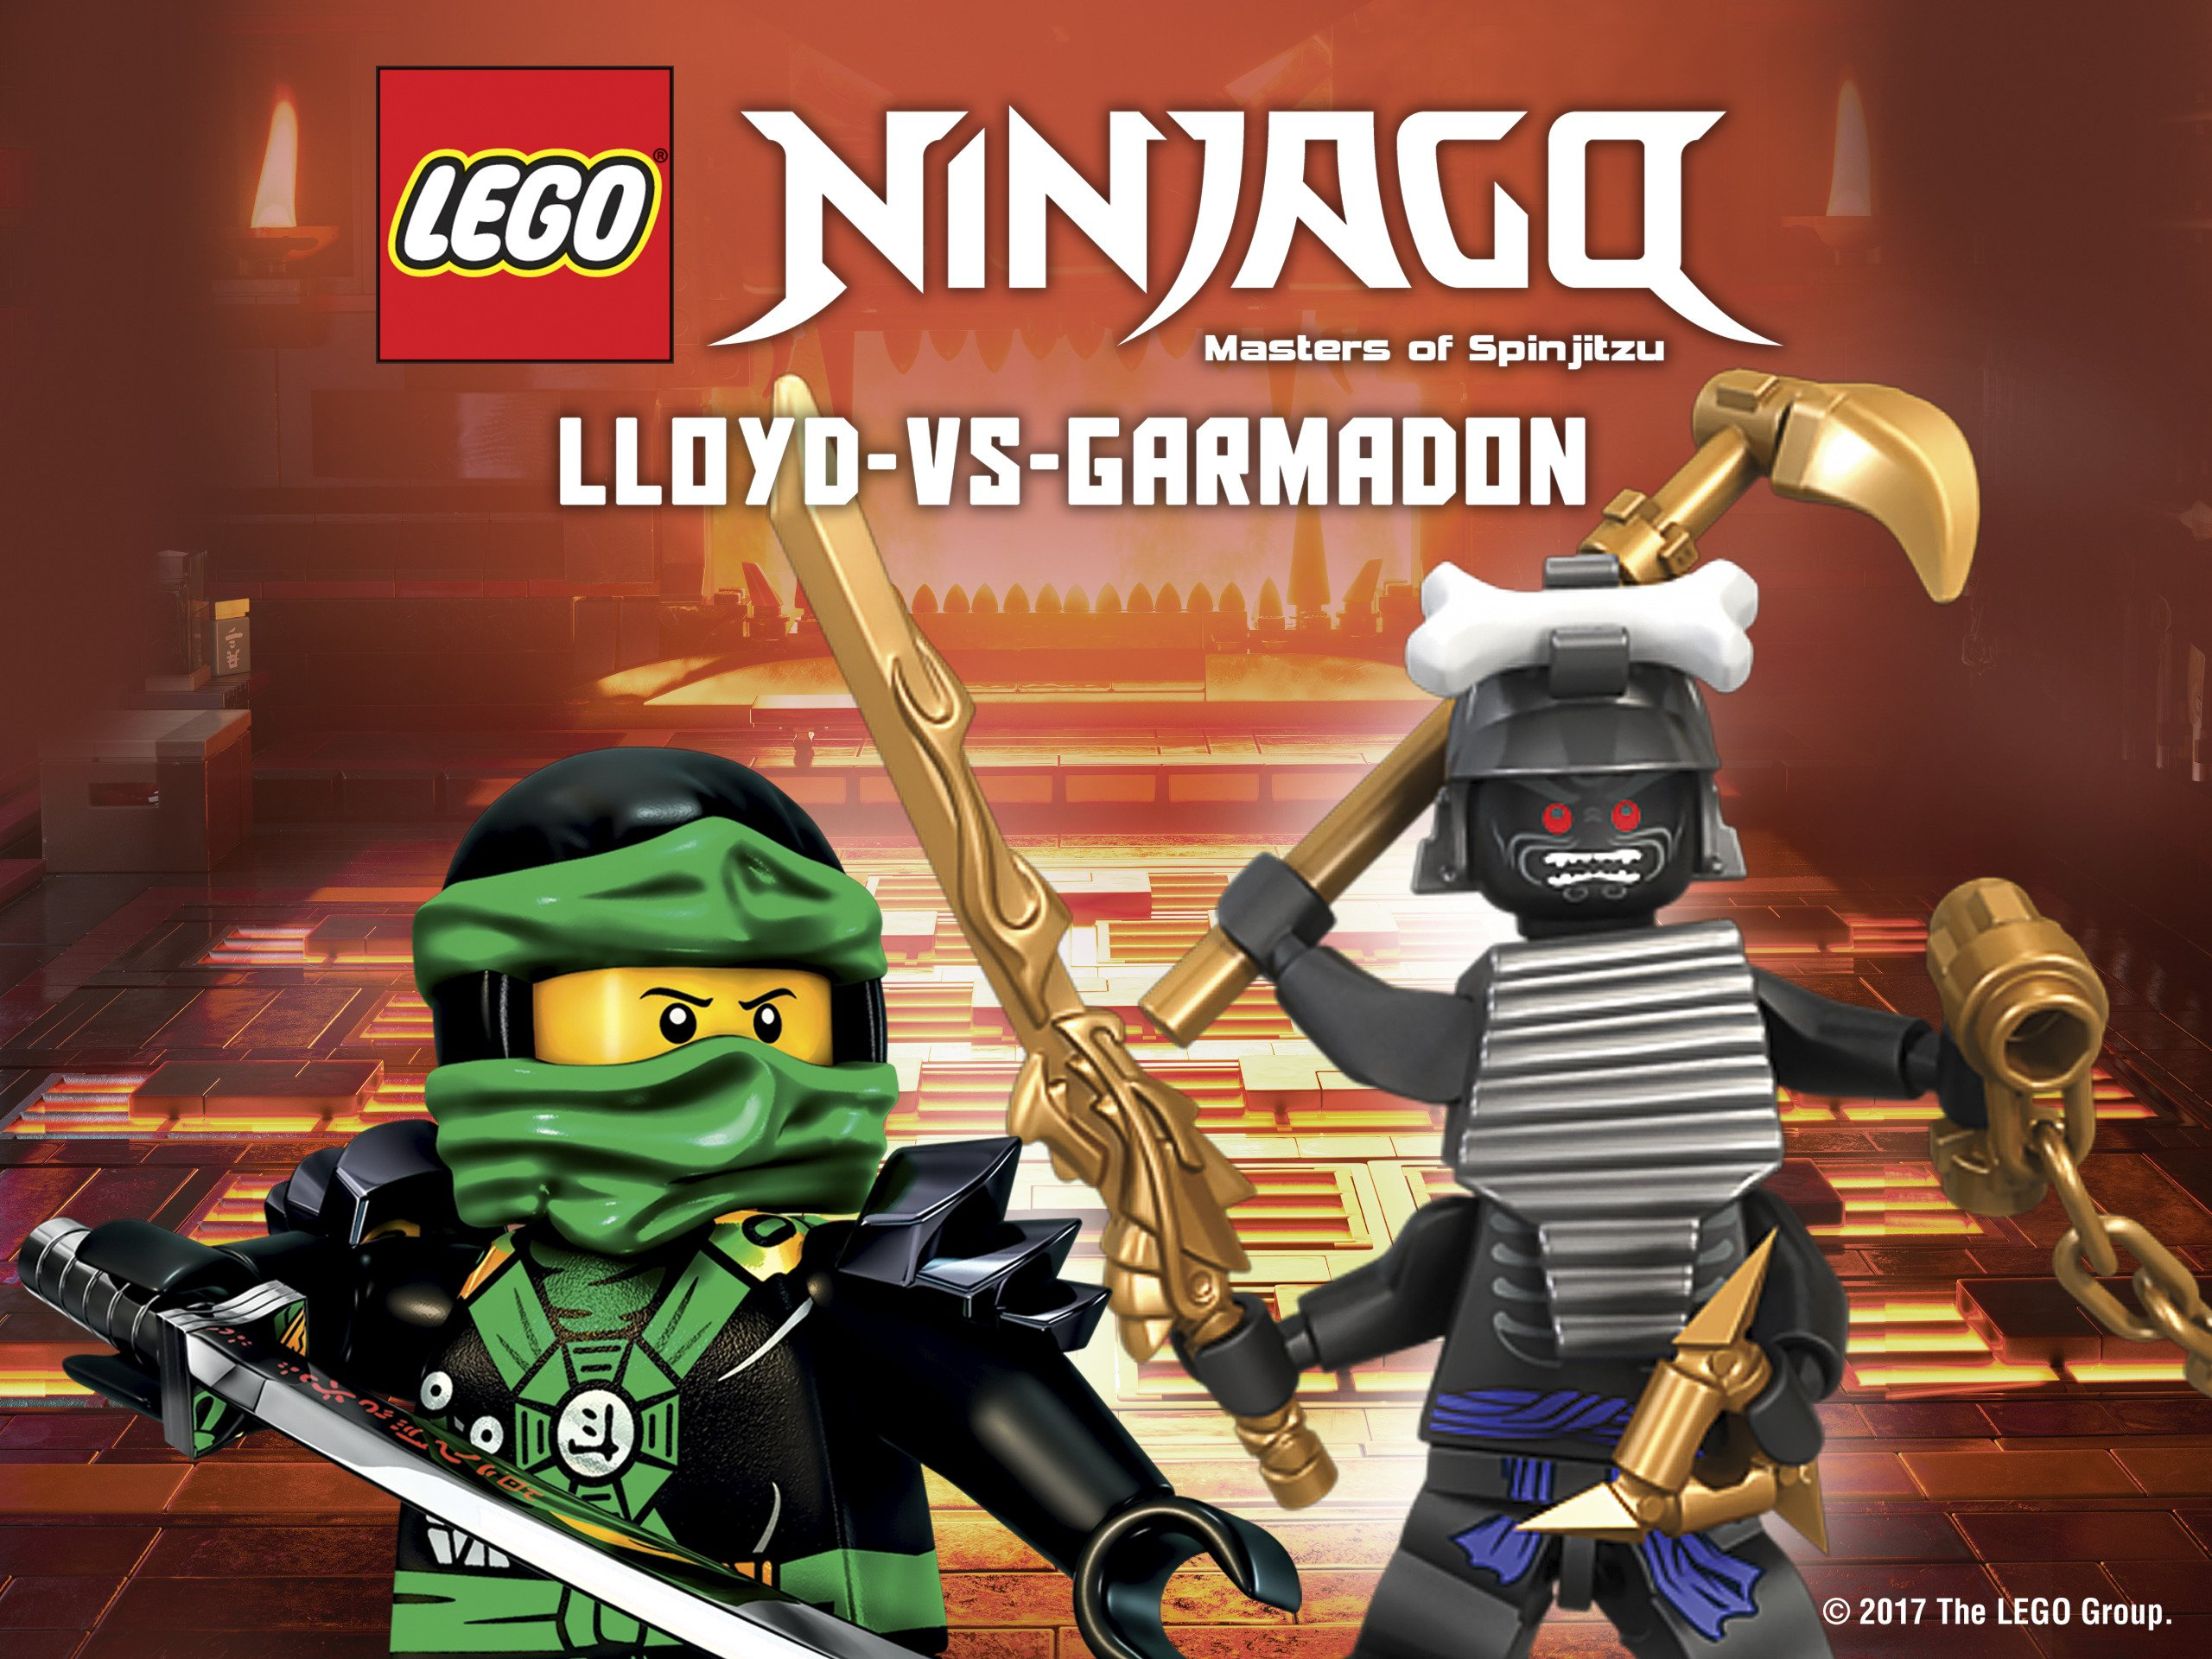 Amazon.com: LEGO Ninjago: Lloyd vs. Garmadon: Vincent Tong ...